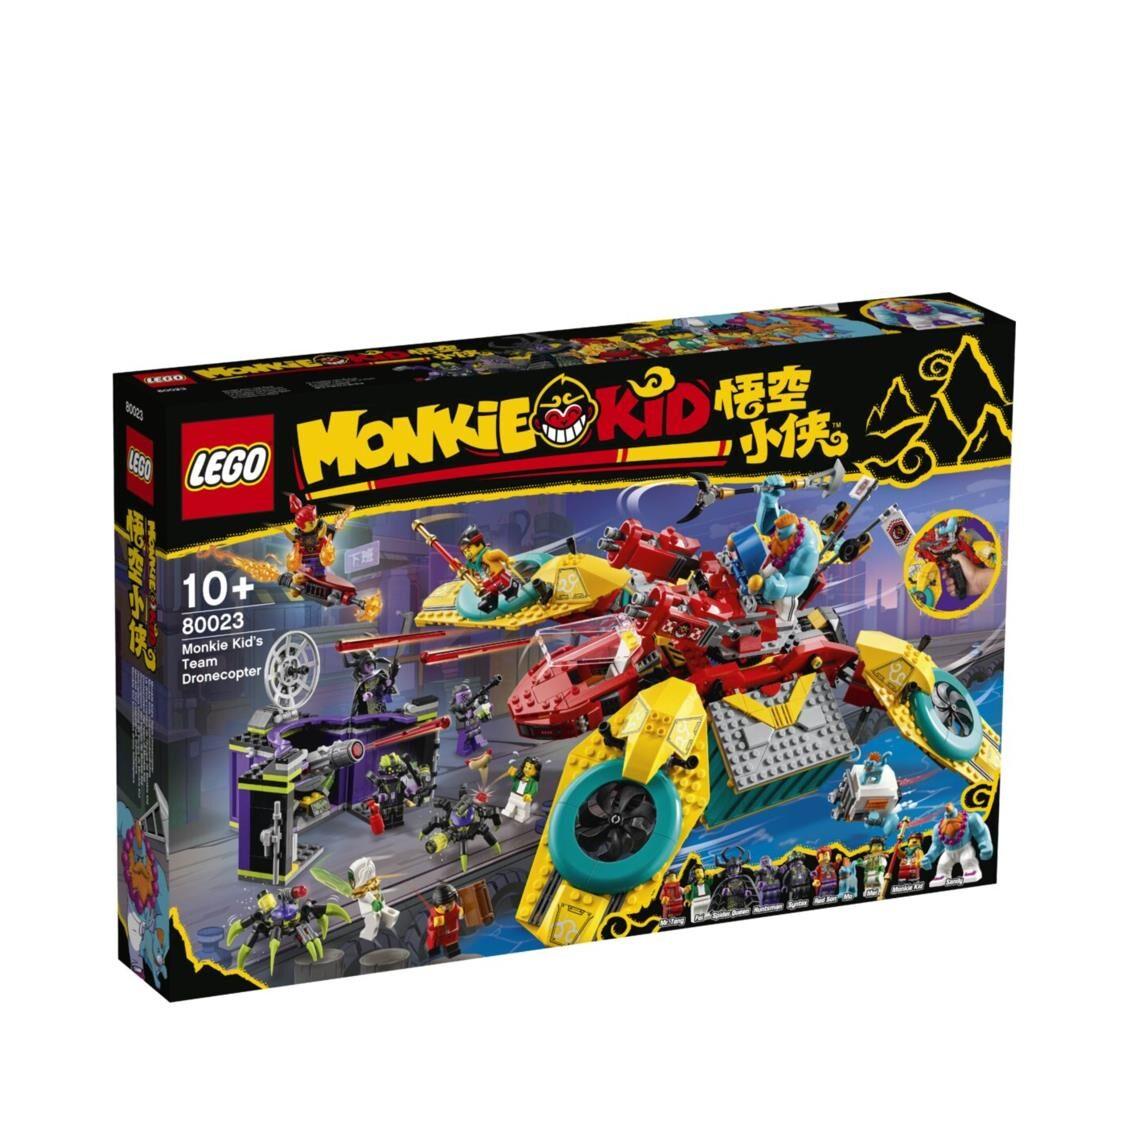 LEGO Monkie Kid - Monkie Kids Team Dronecopter 80023